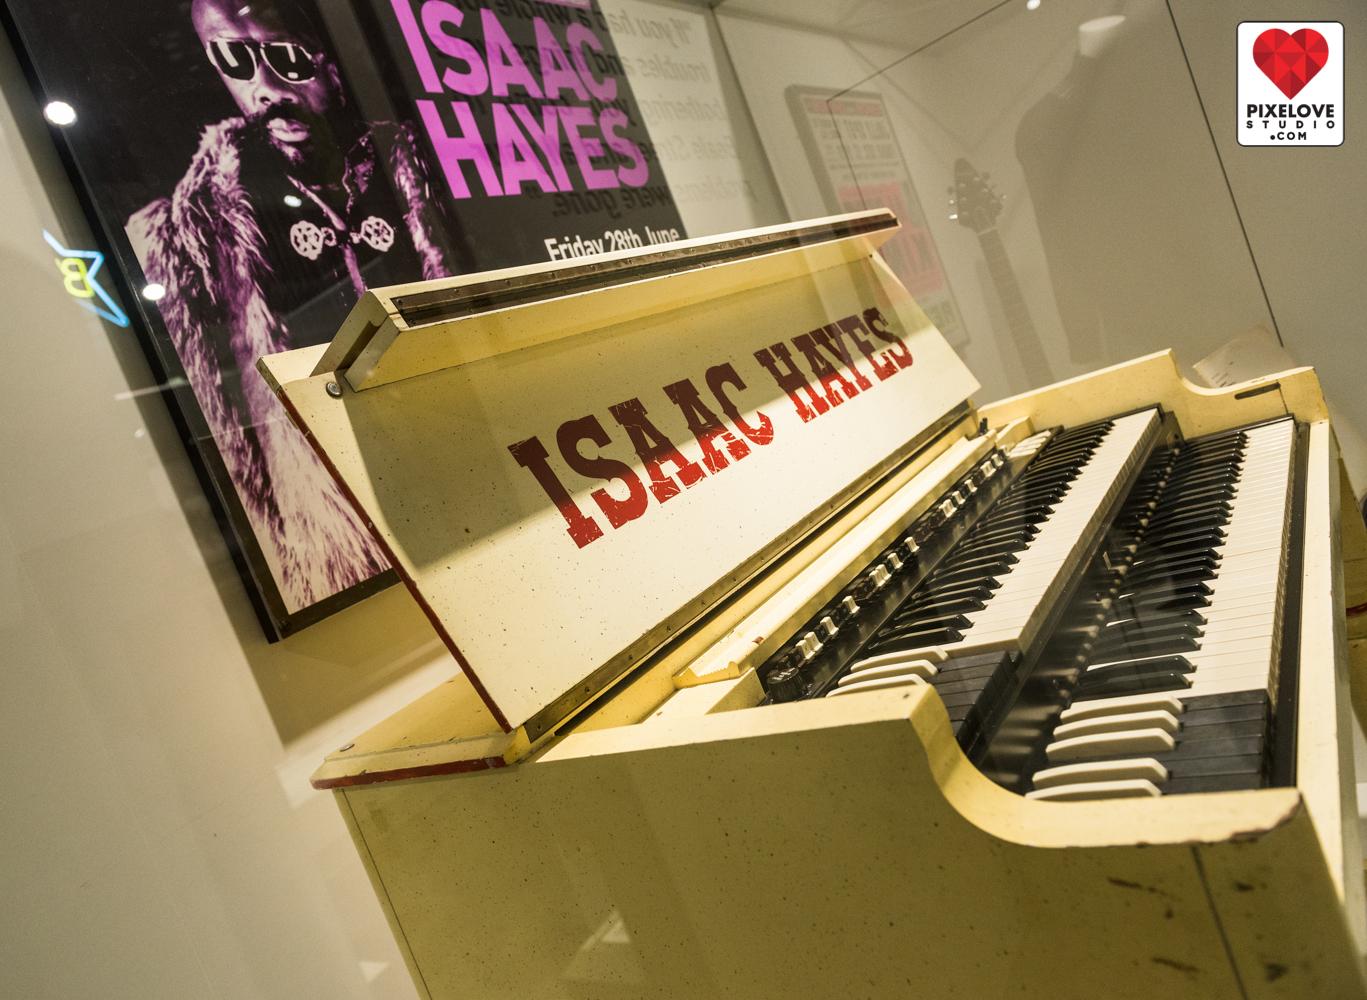 pixelove studio fotografia viajes memphis music hall of fame-5